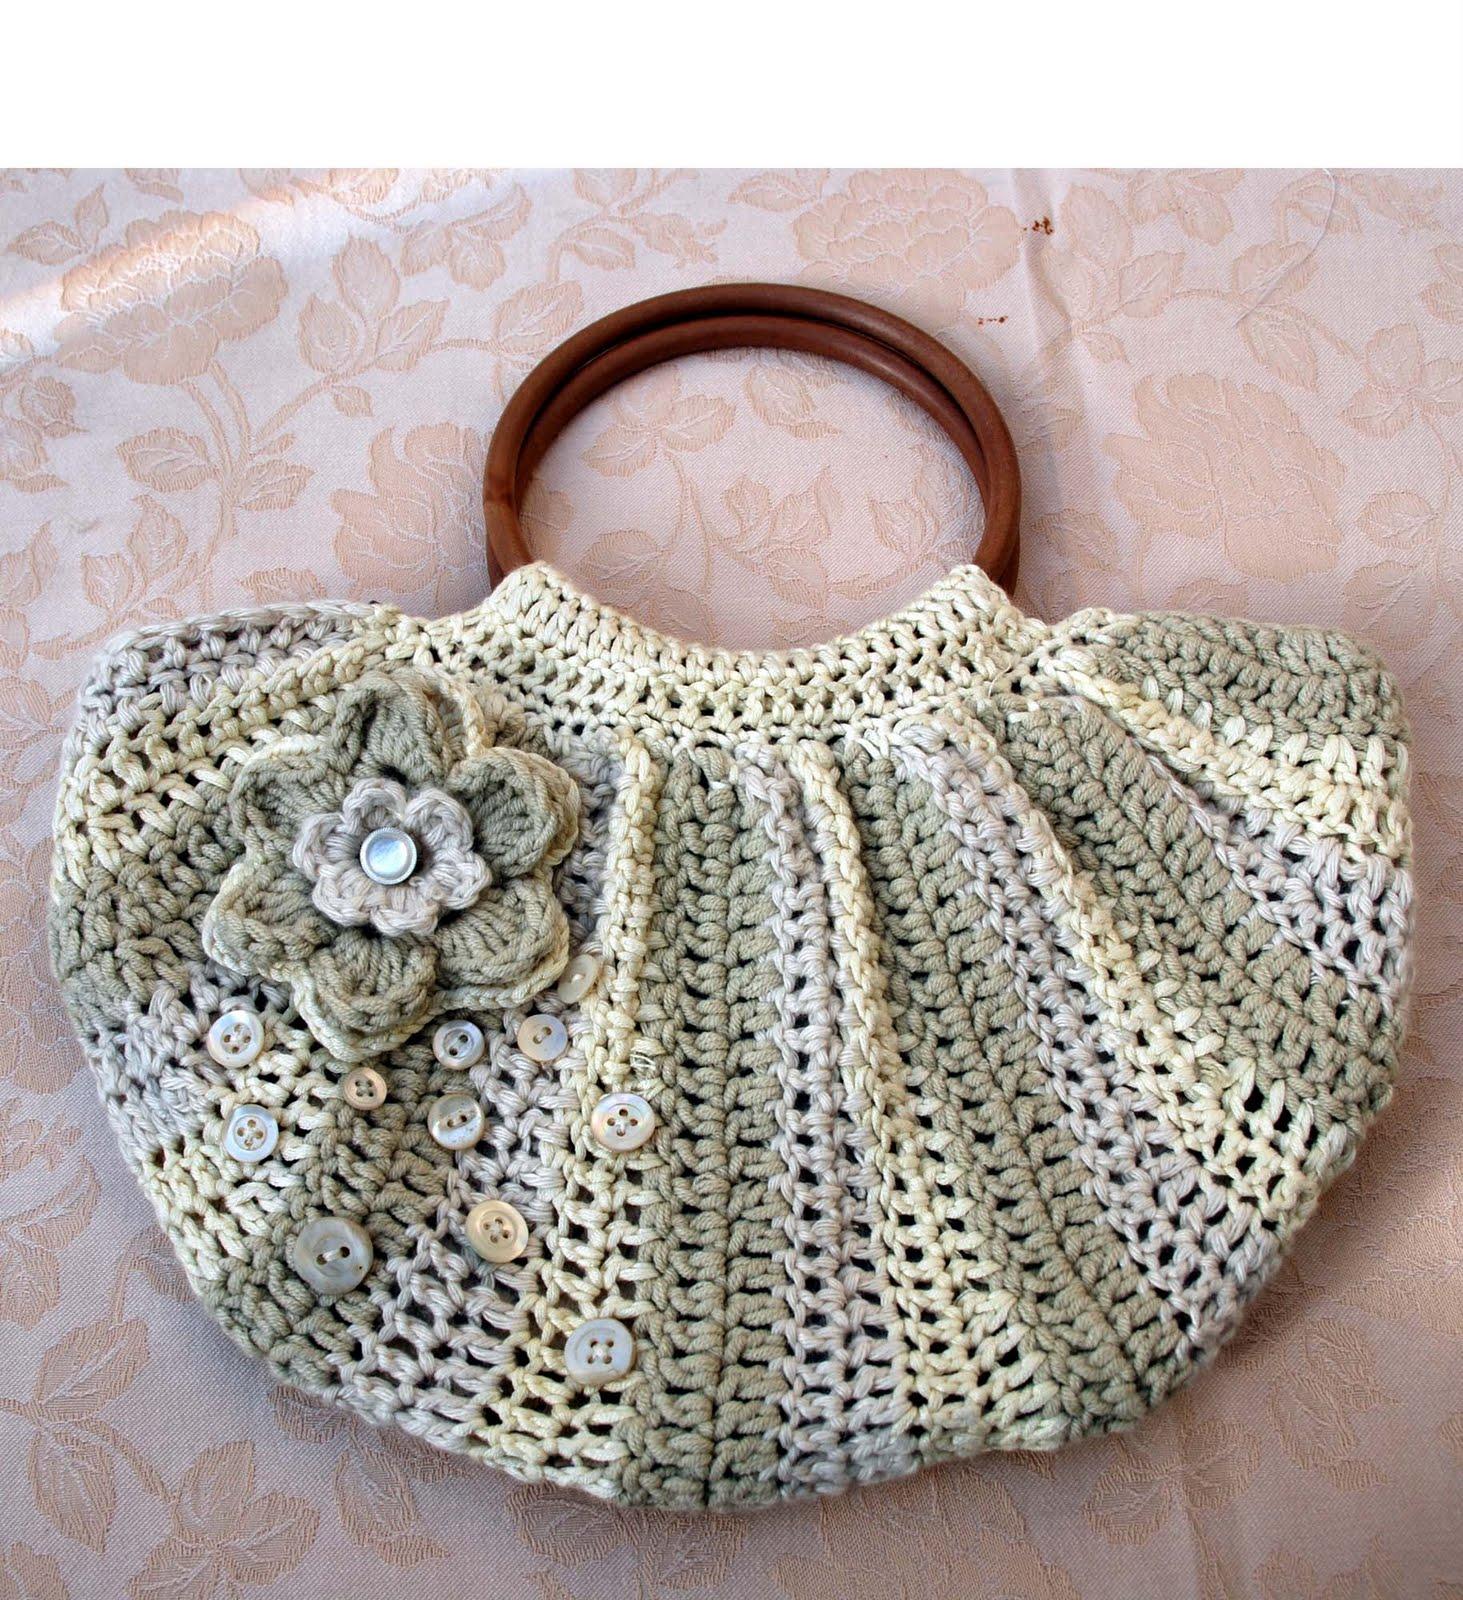 Crochet Patterns For A Purse : Knitting Patterns Free: crochet bag